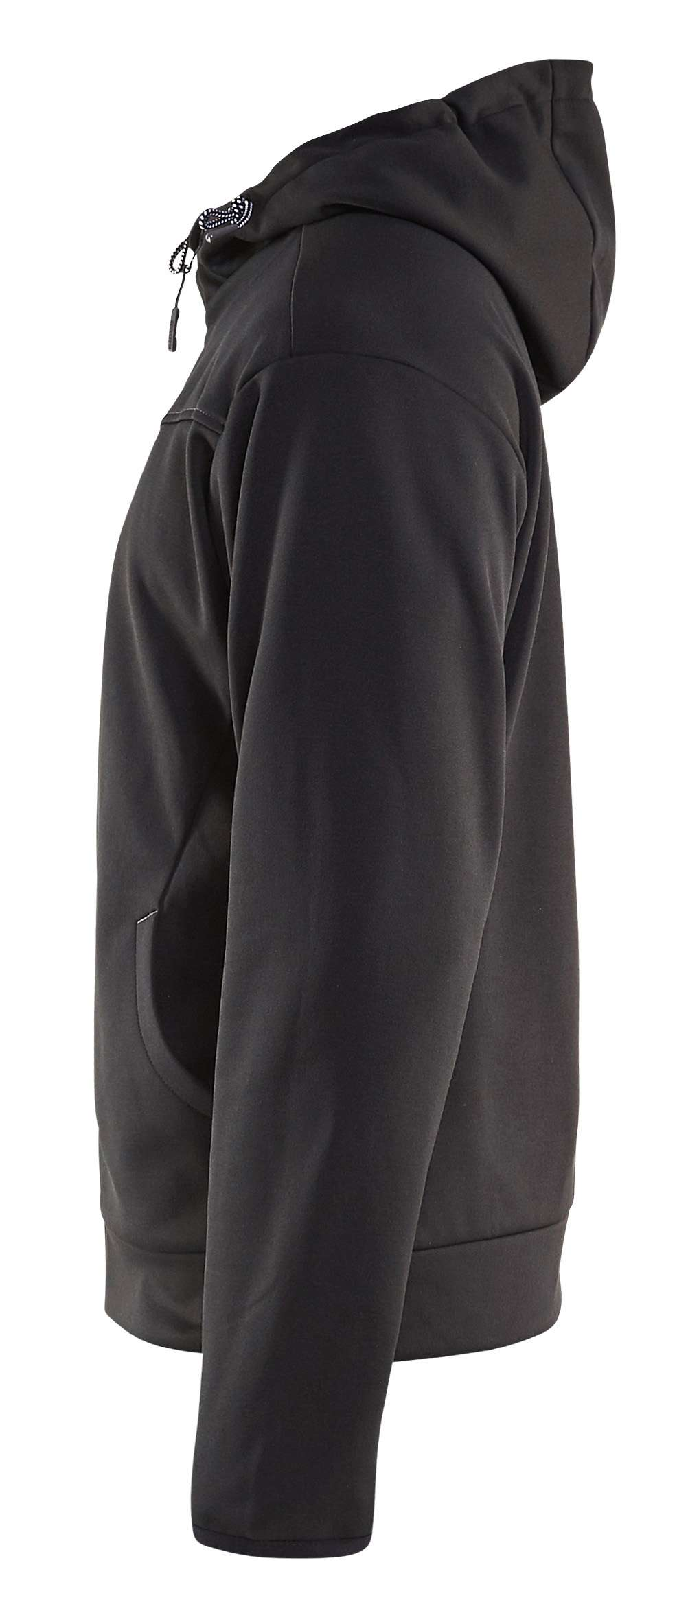 Blaklader Hooded sweatvesten 33632526 zwart-grijs(9998)